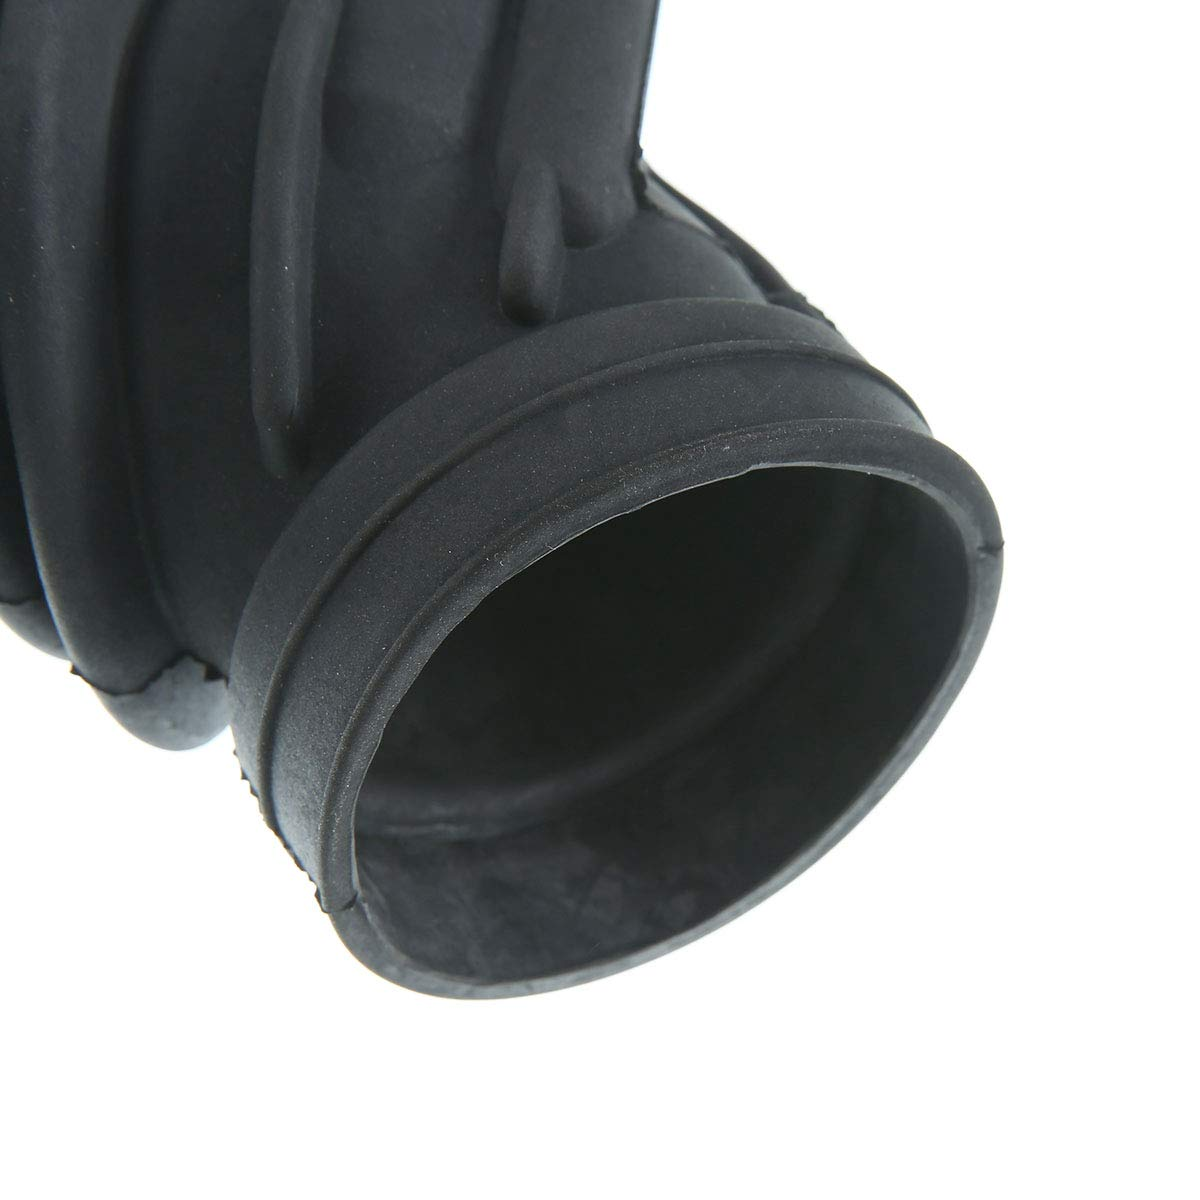 Tuyau daspiration pour tuyau daspiration 3 E36 318i Z3 1.8i 1993-1999 13711739574